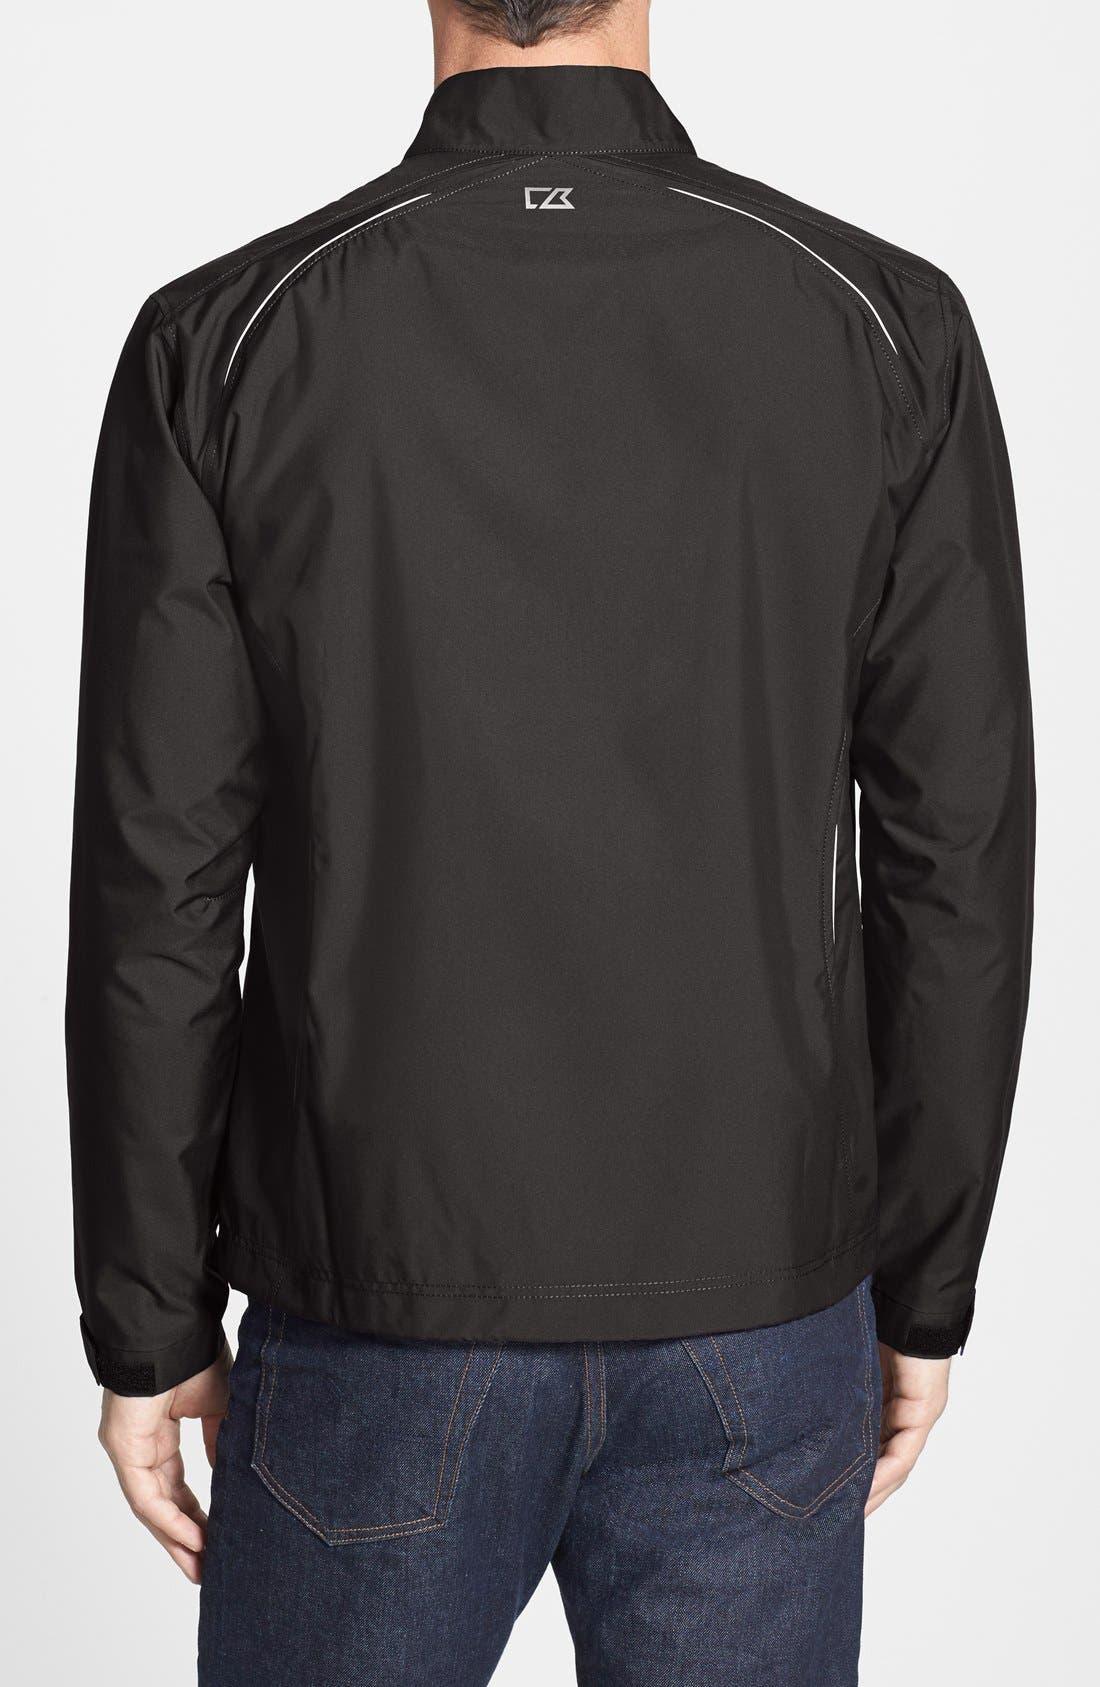 Baltimore Ravens - Beacon WeatherTec Wind & Water Resistant Jacket,                             Alternate thumbnail 2, color,                             Black